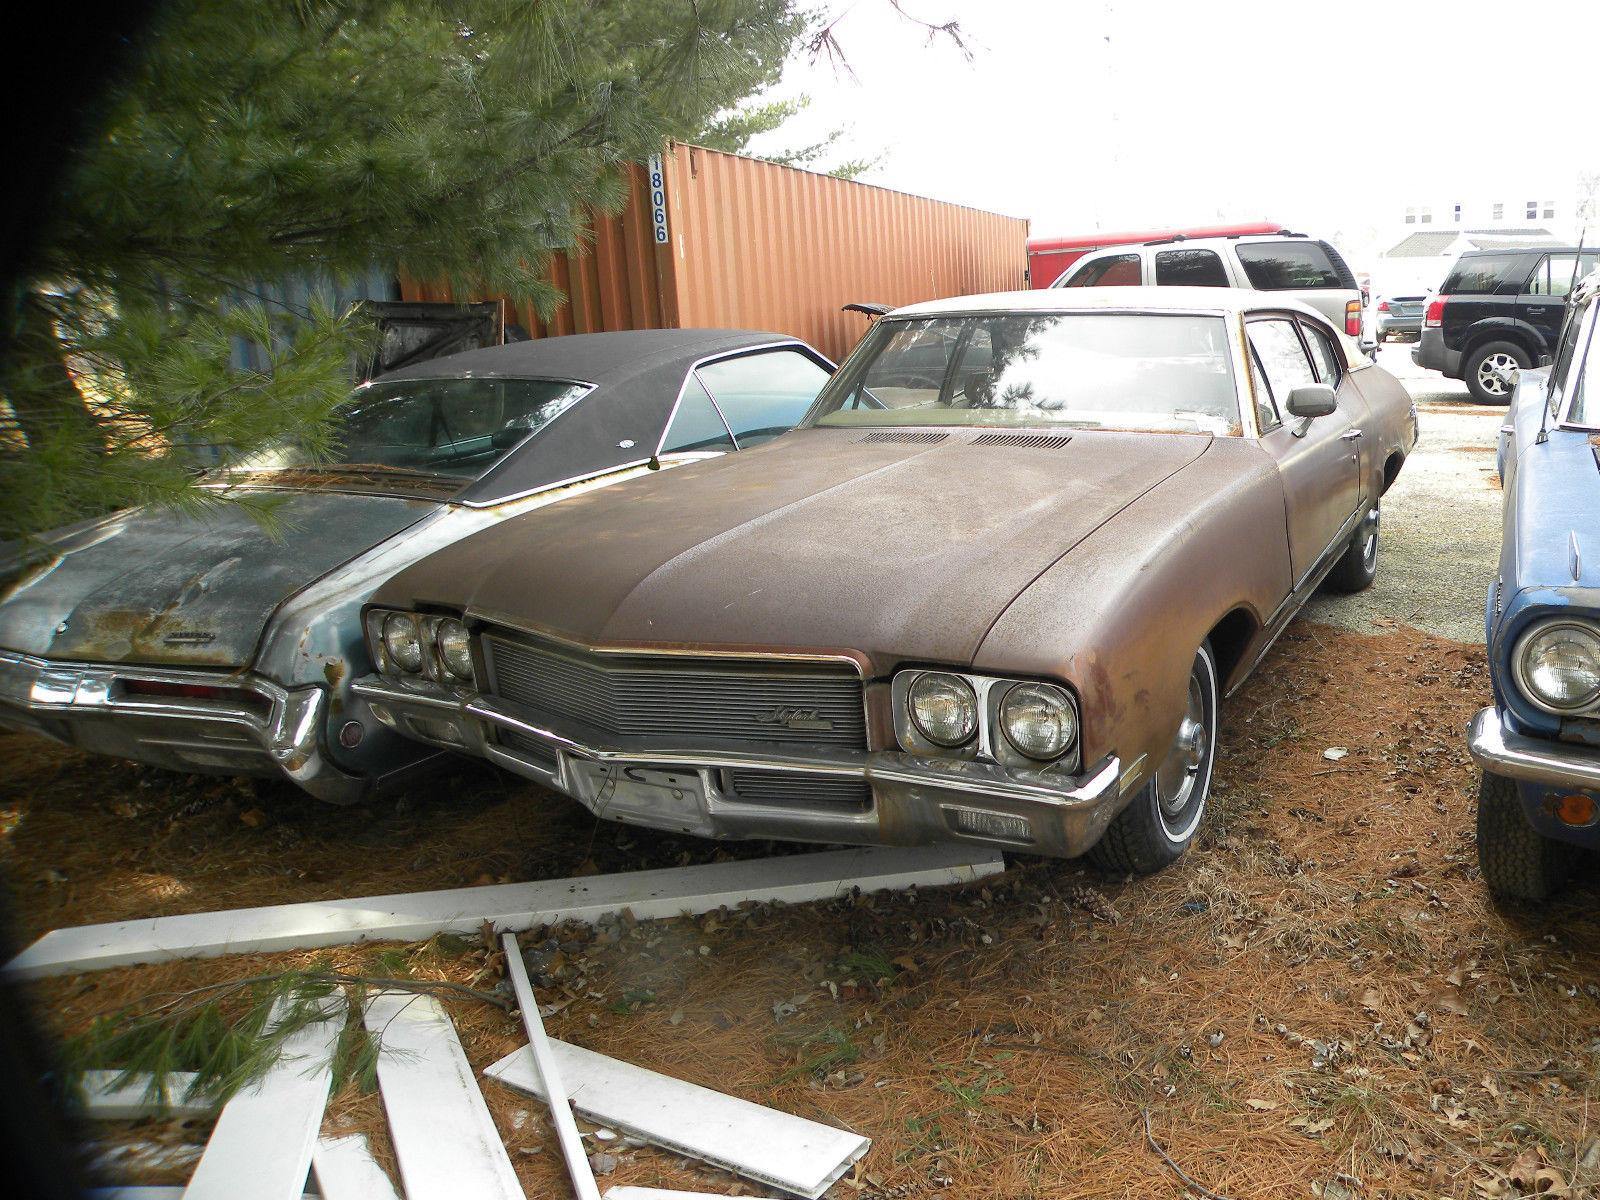 1971 buick skylark base coupe 2-door 5.7l for sale: photos